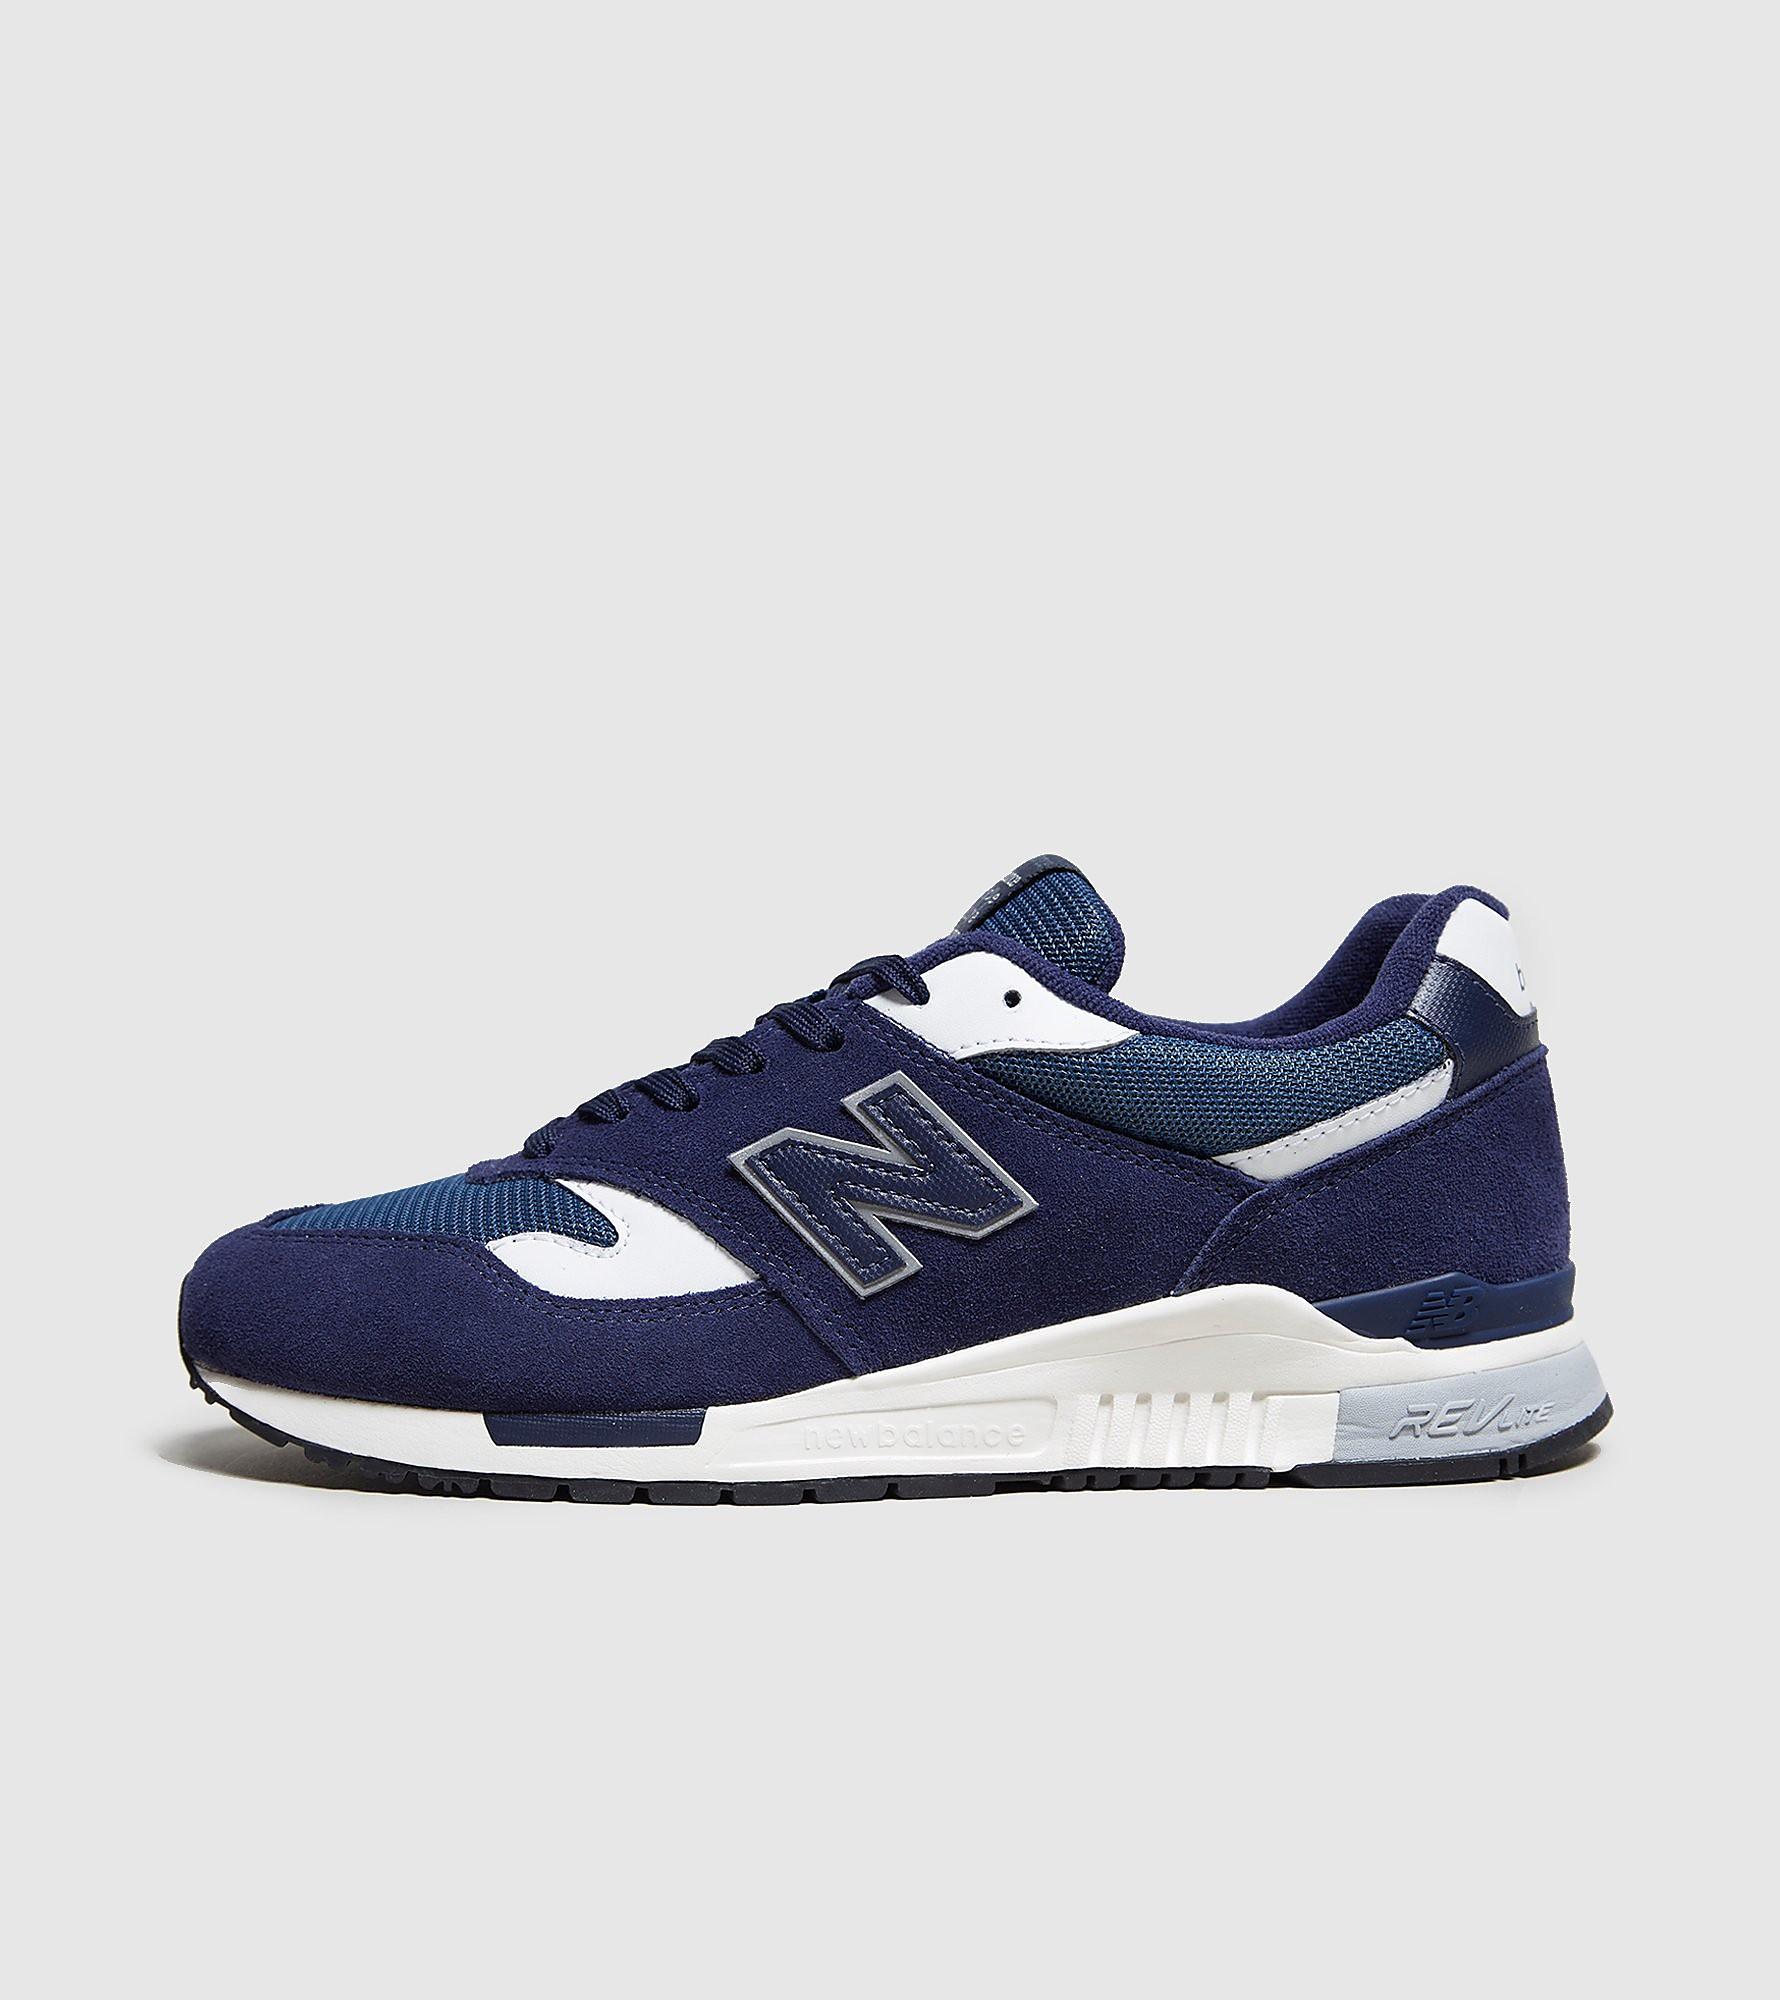 New Balance 840, azul/blanco